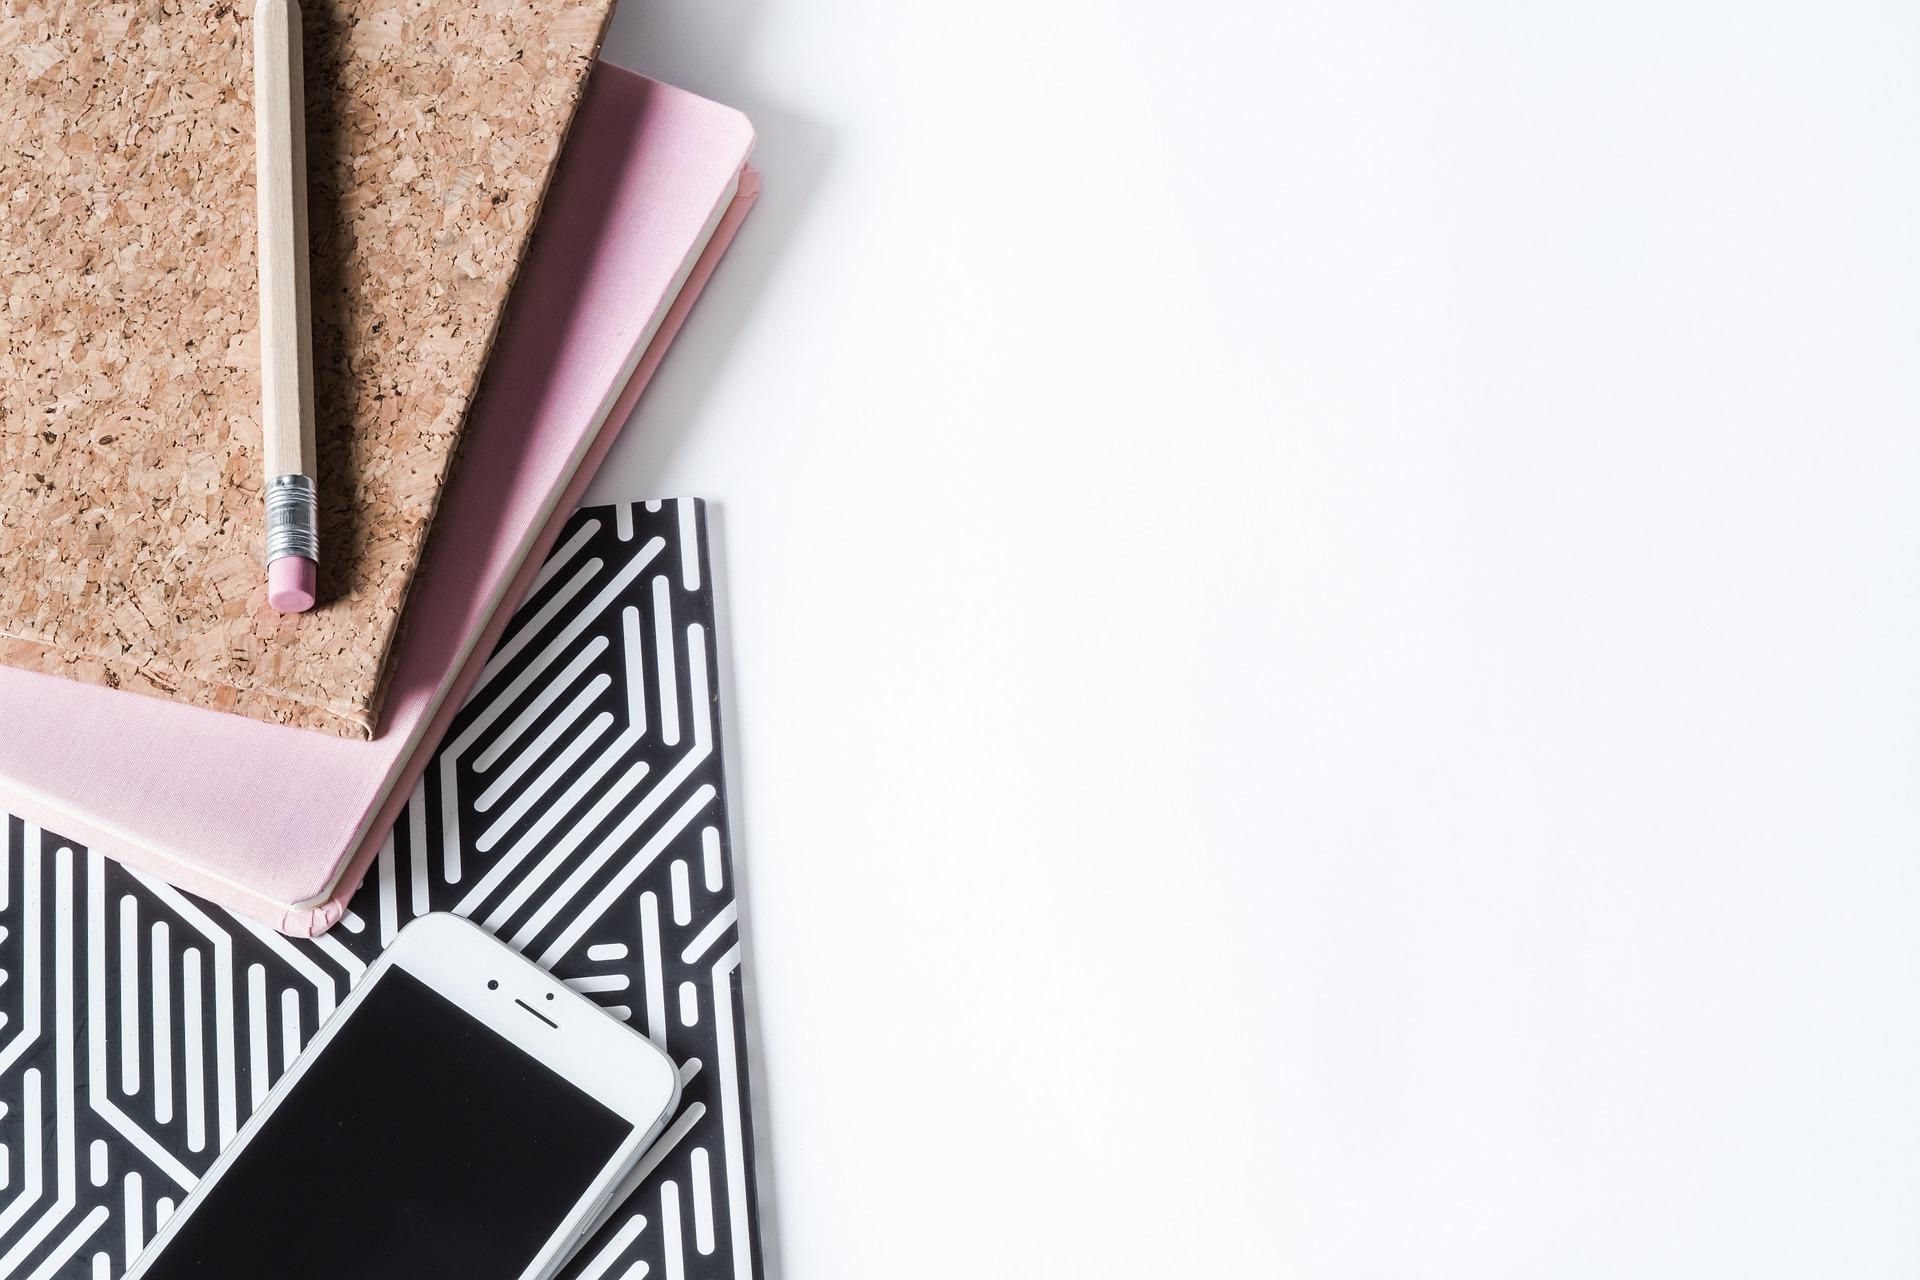 Instagram活用法2 使いこなすと便利な3つの検索方法